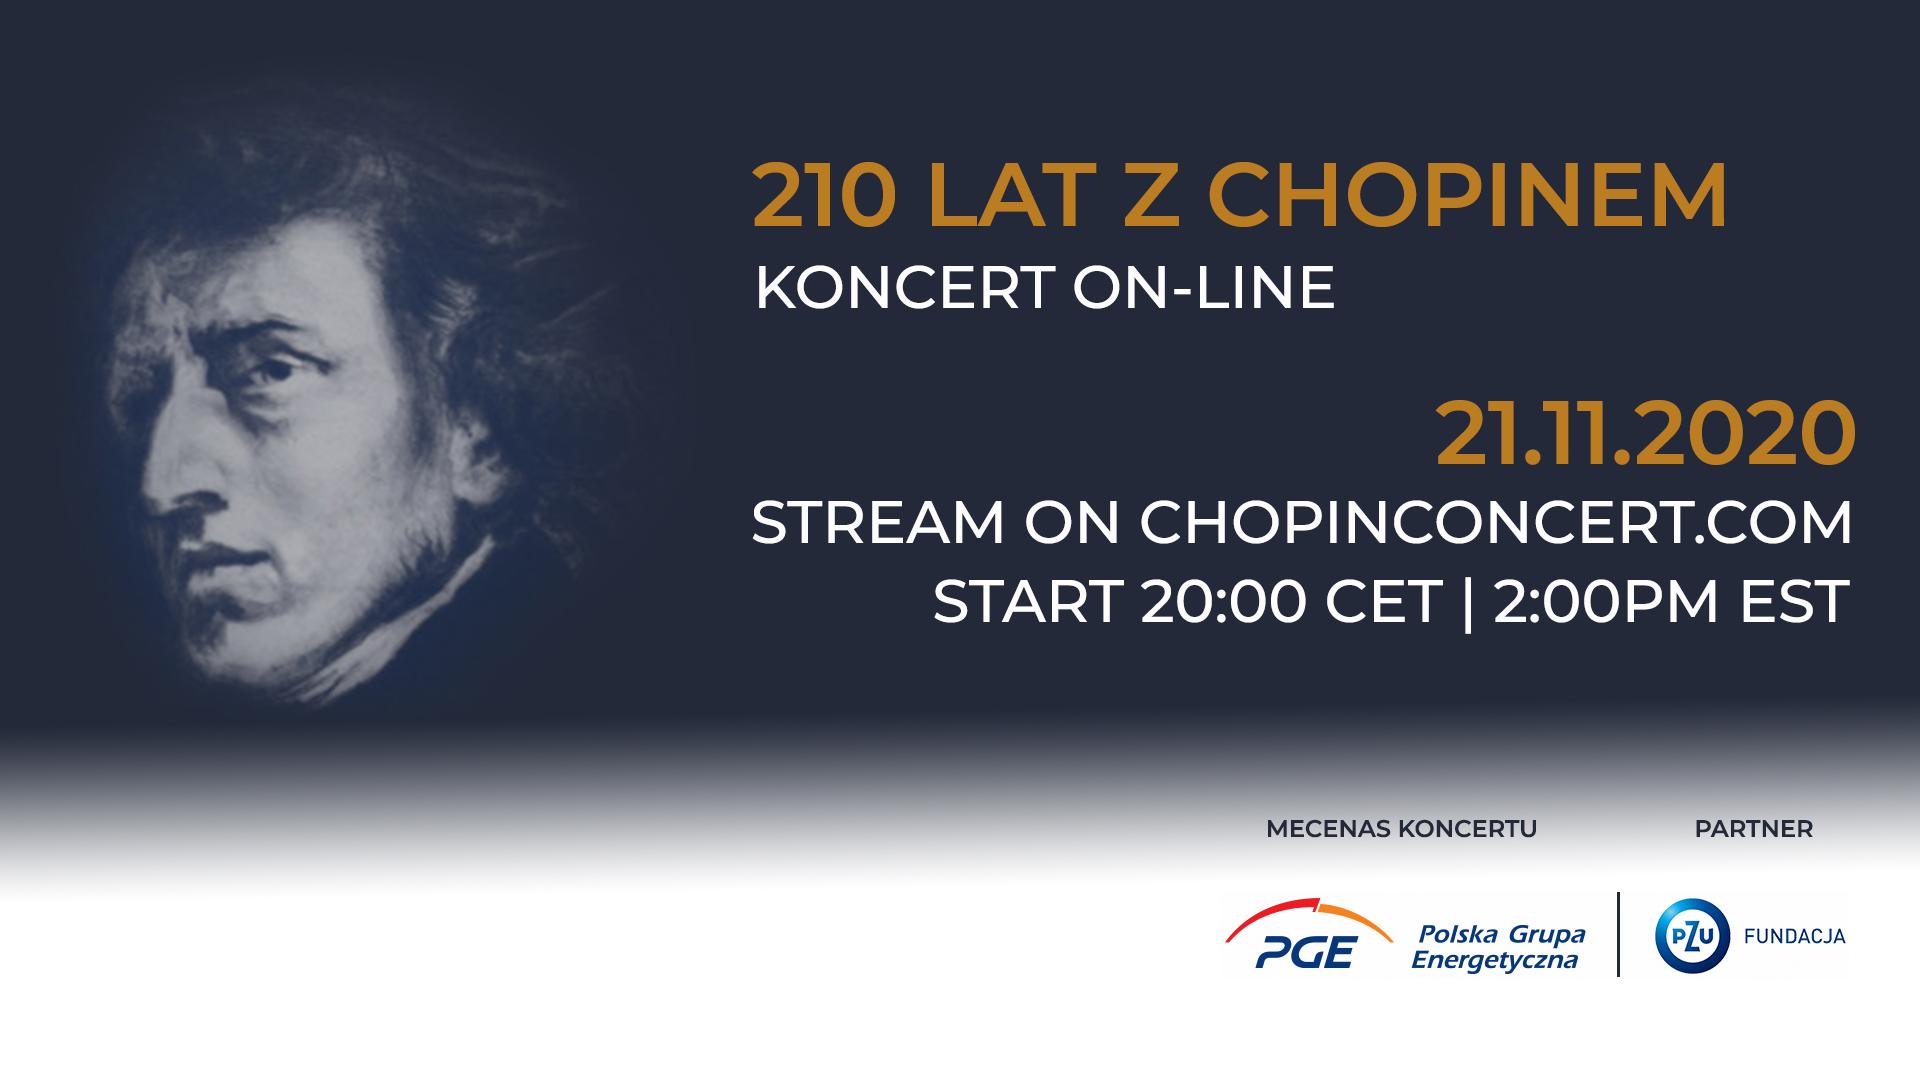 210-lat-z-chopinem-koncert_1.jpg